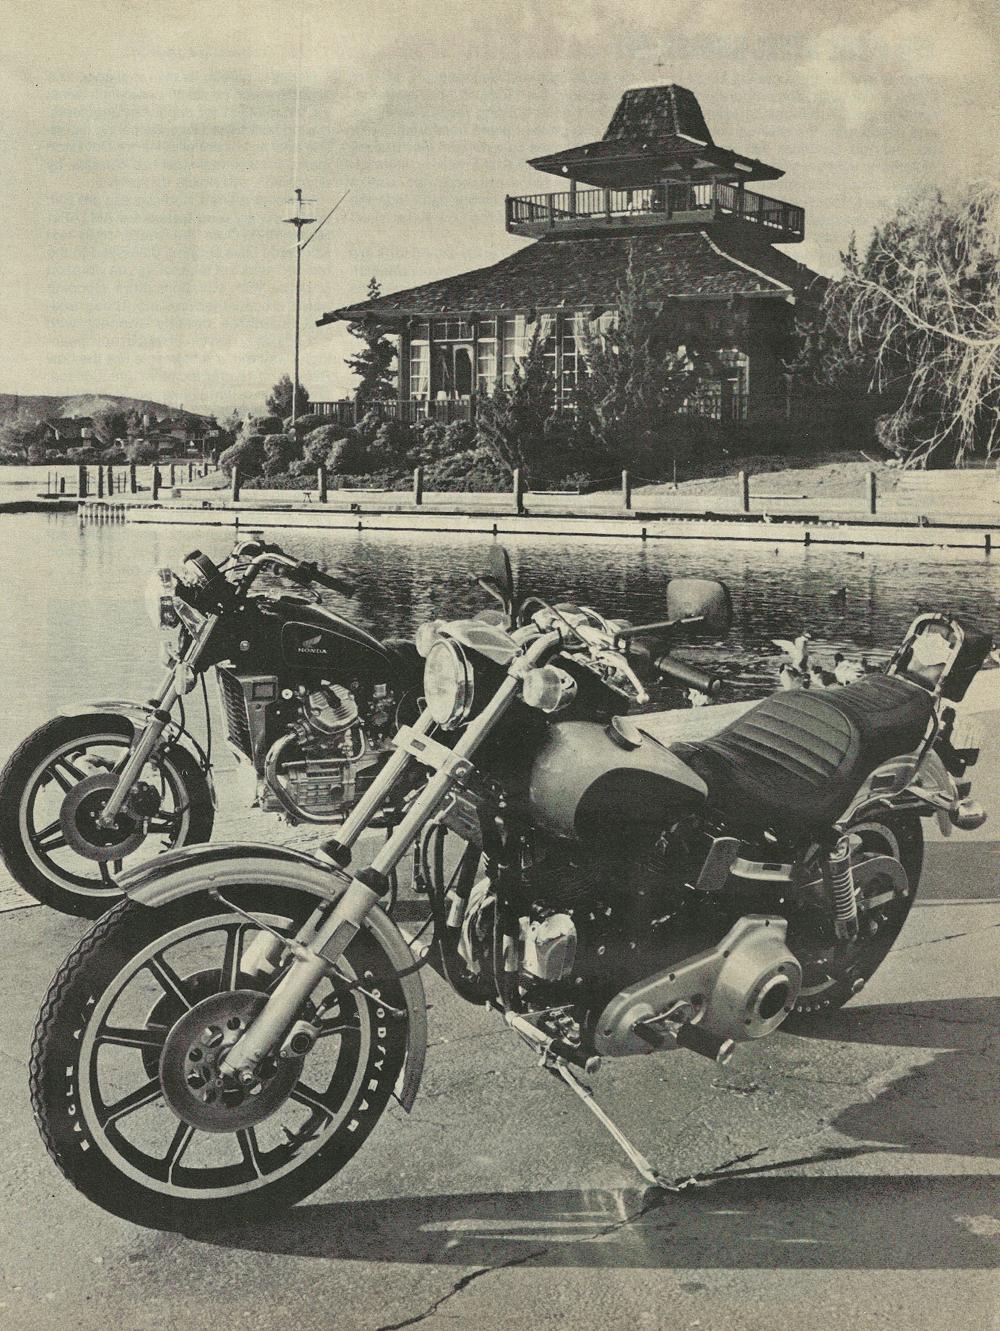 1979 Honda CX500 vs Harley FXS-80 Lowrider 4.jpg